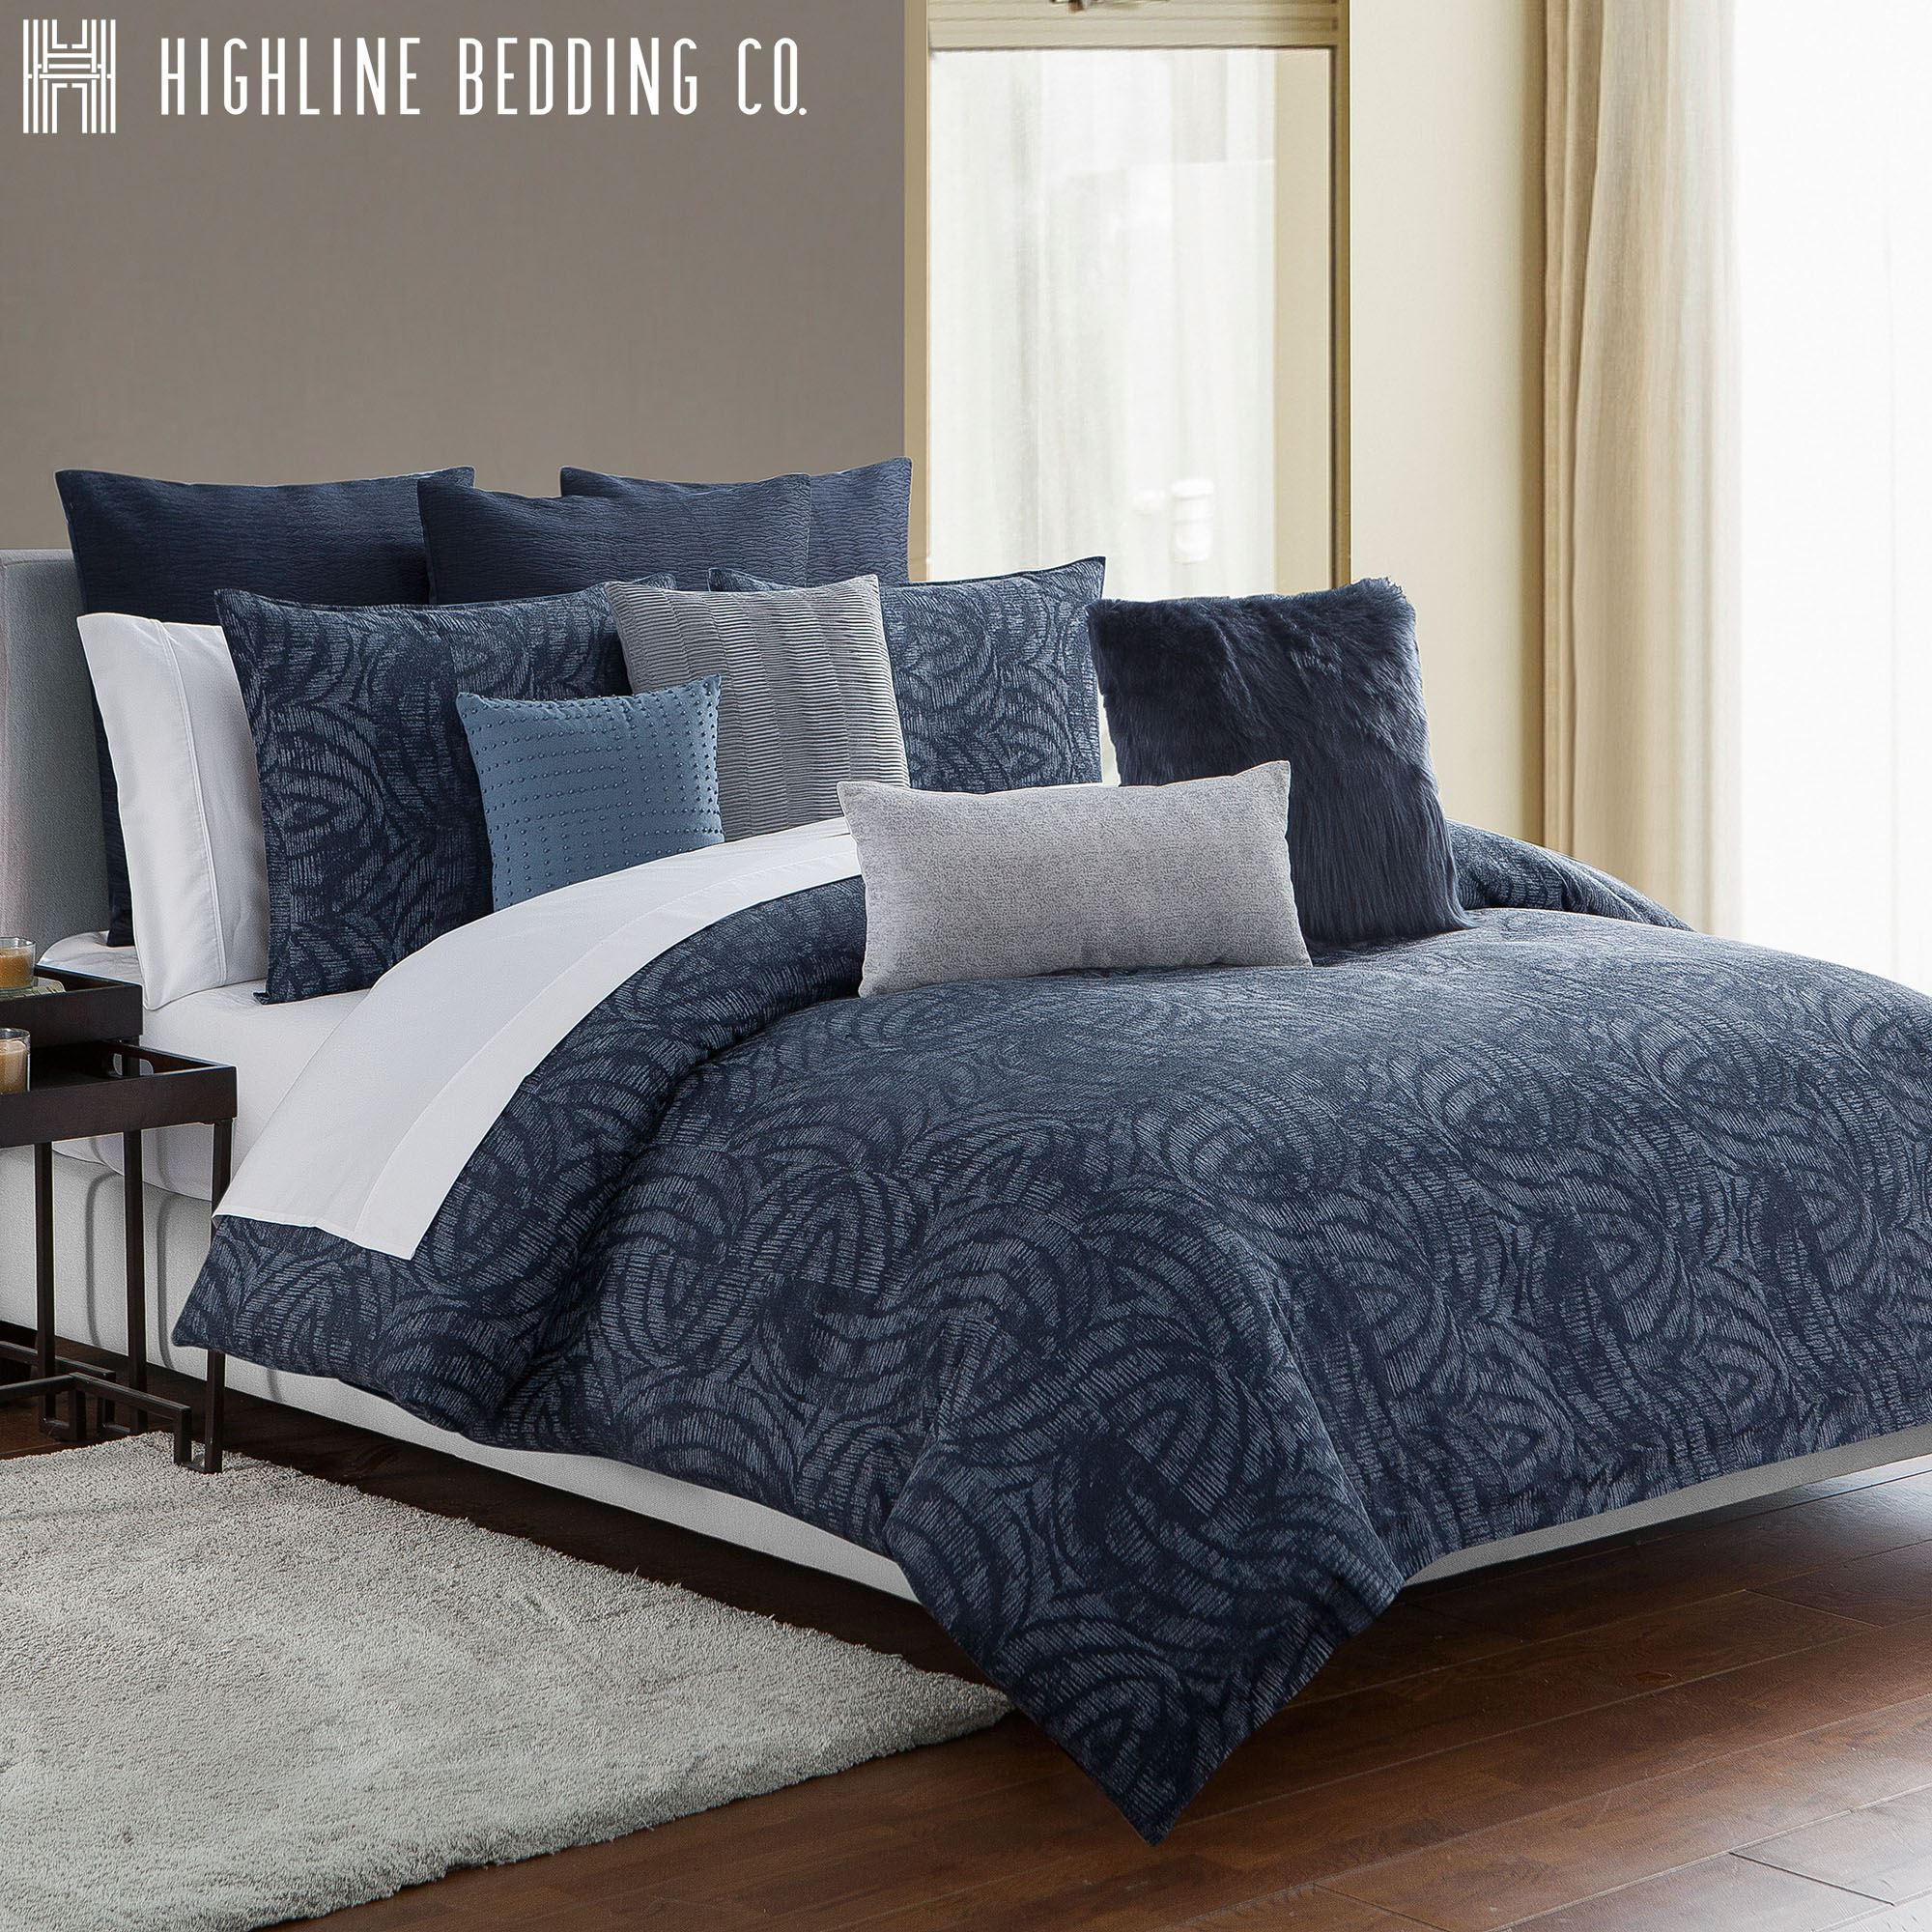 Jakarta Swirl Midnight Blue Mini Comforter Set by Highline